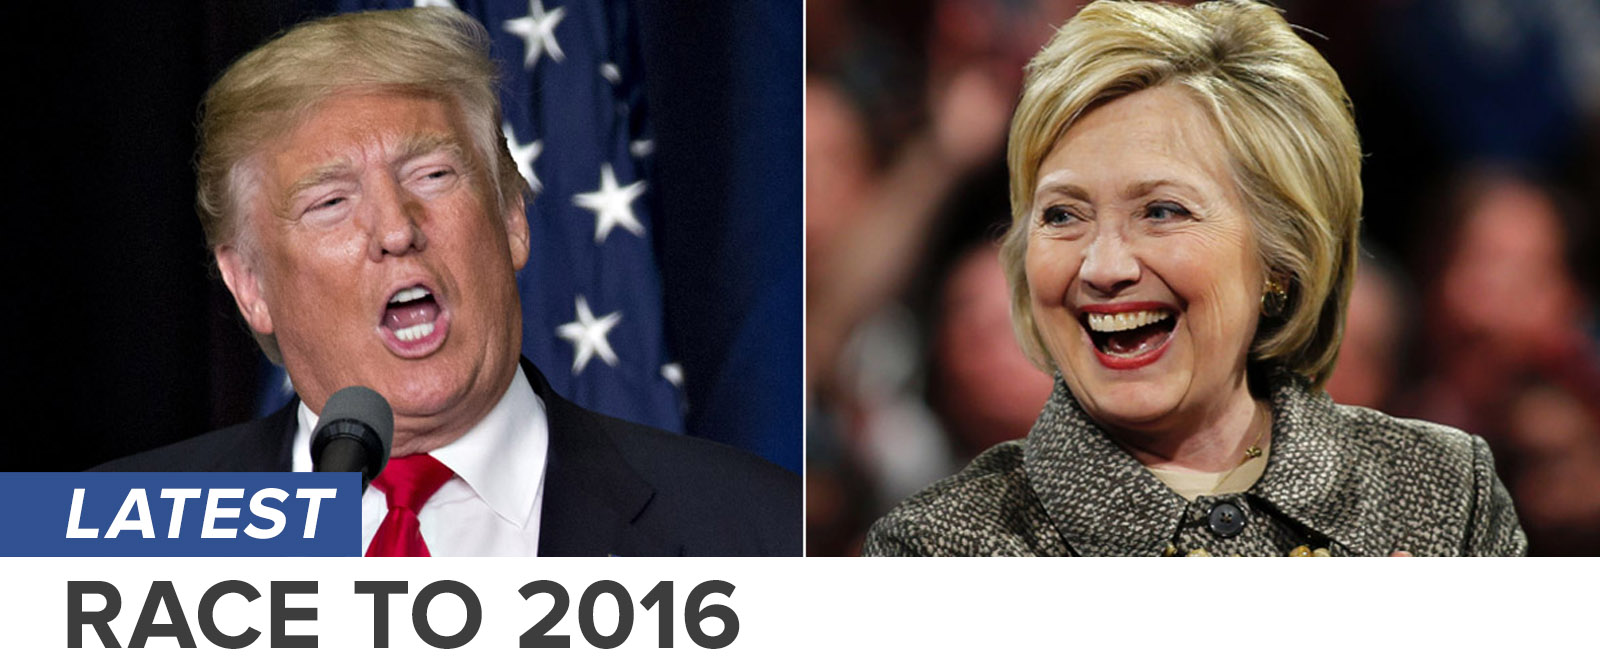 AppleTV_Trump_Clinton1_MEM_160427